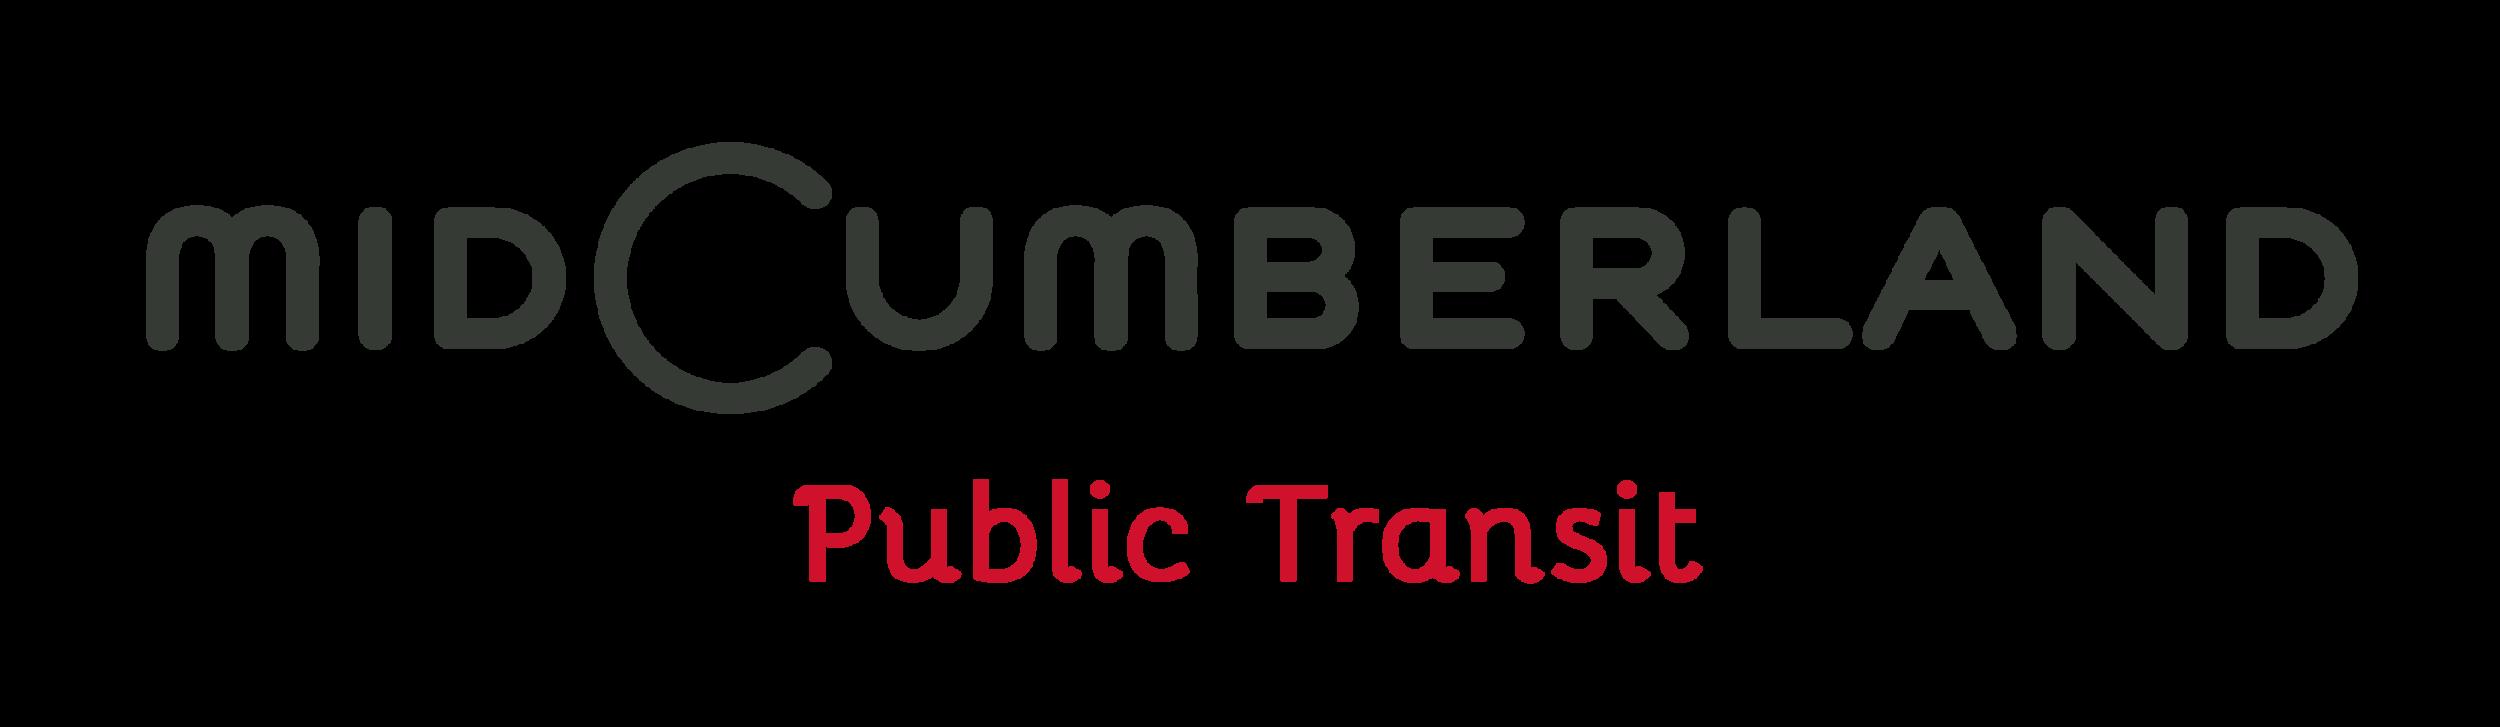 midcumberland-transportation-header.png